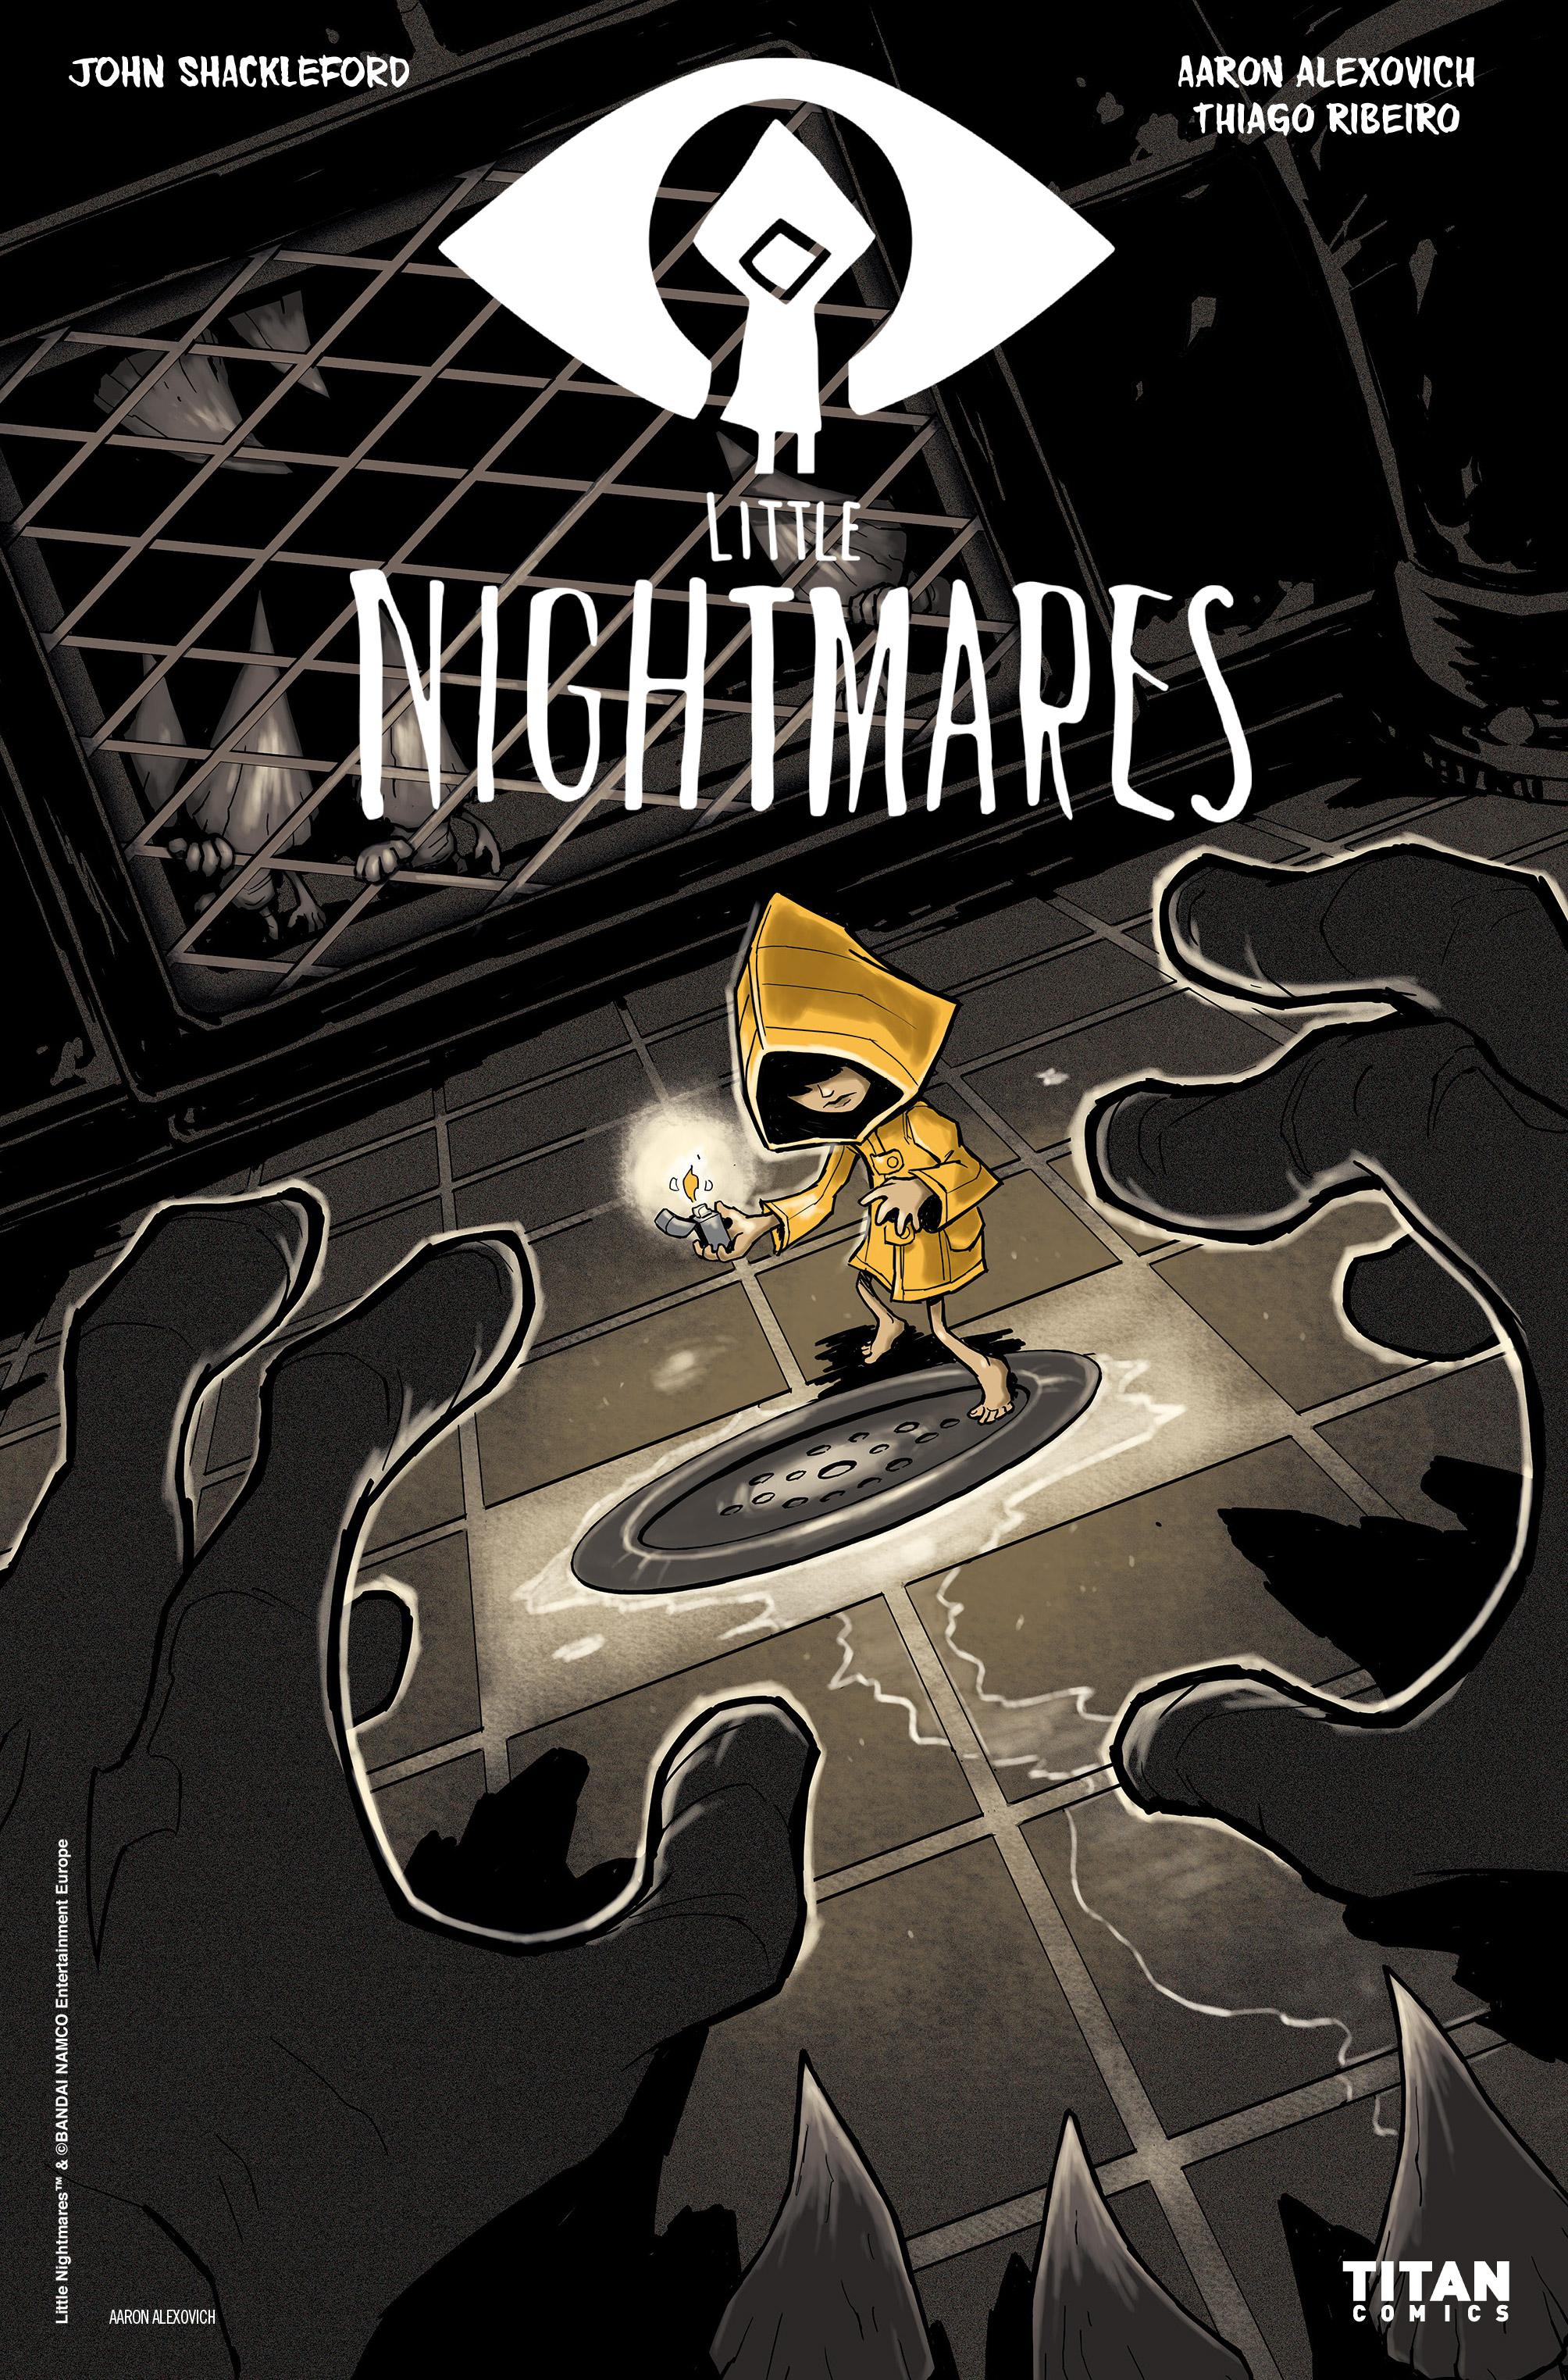 Read online Little Nightmares comic -  Issue #1 - 1